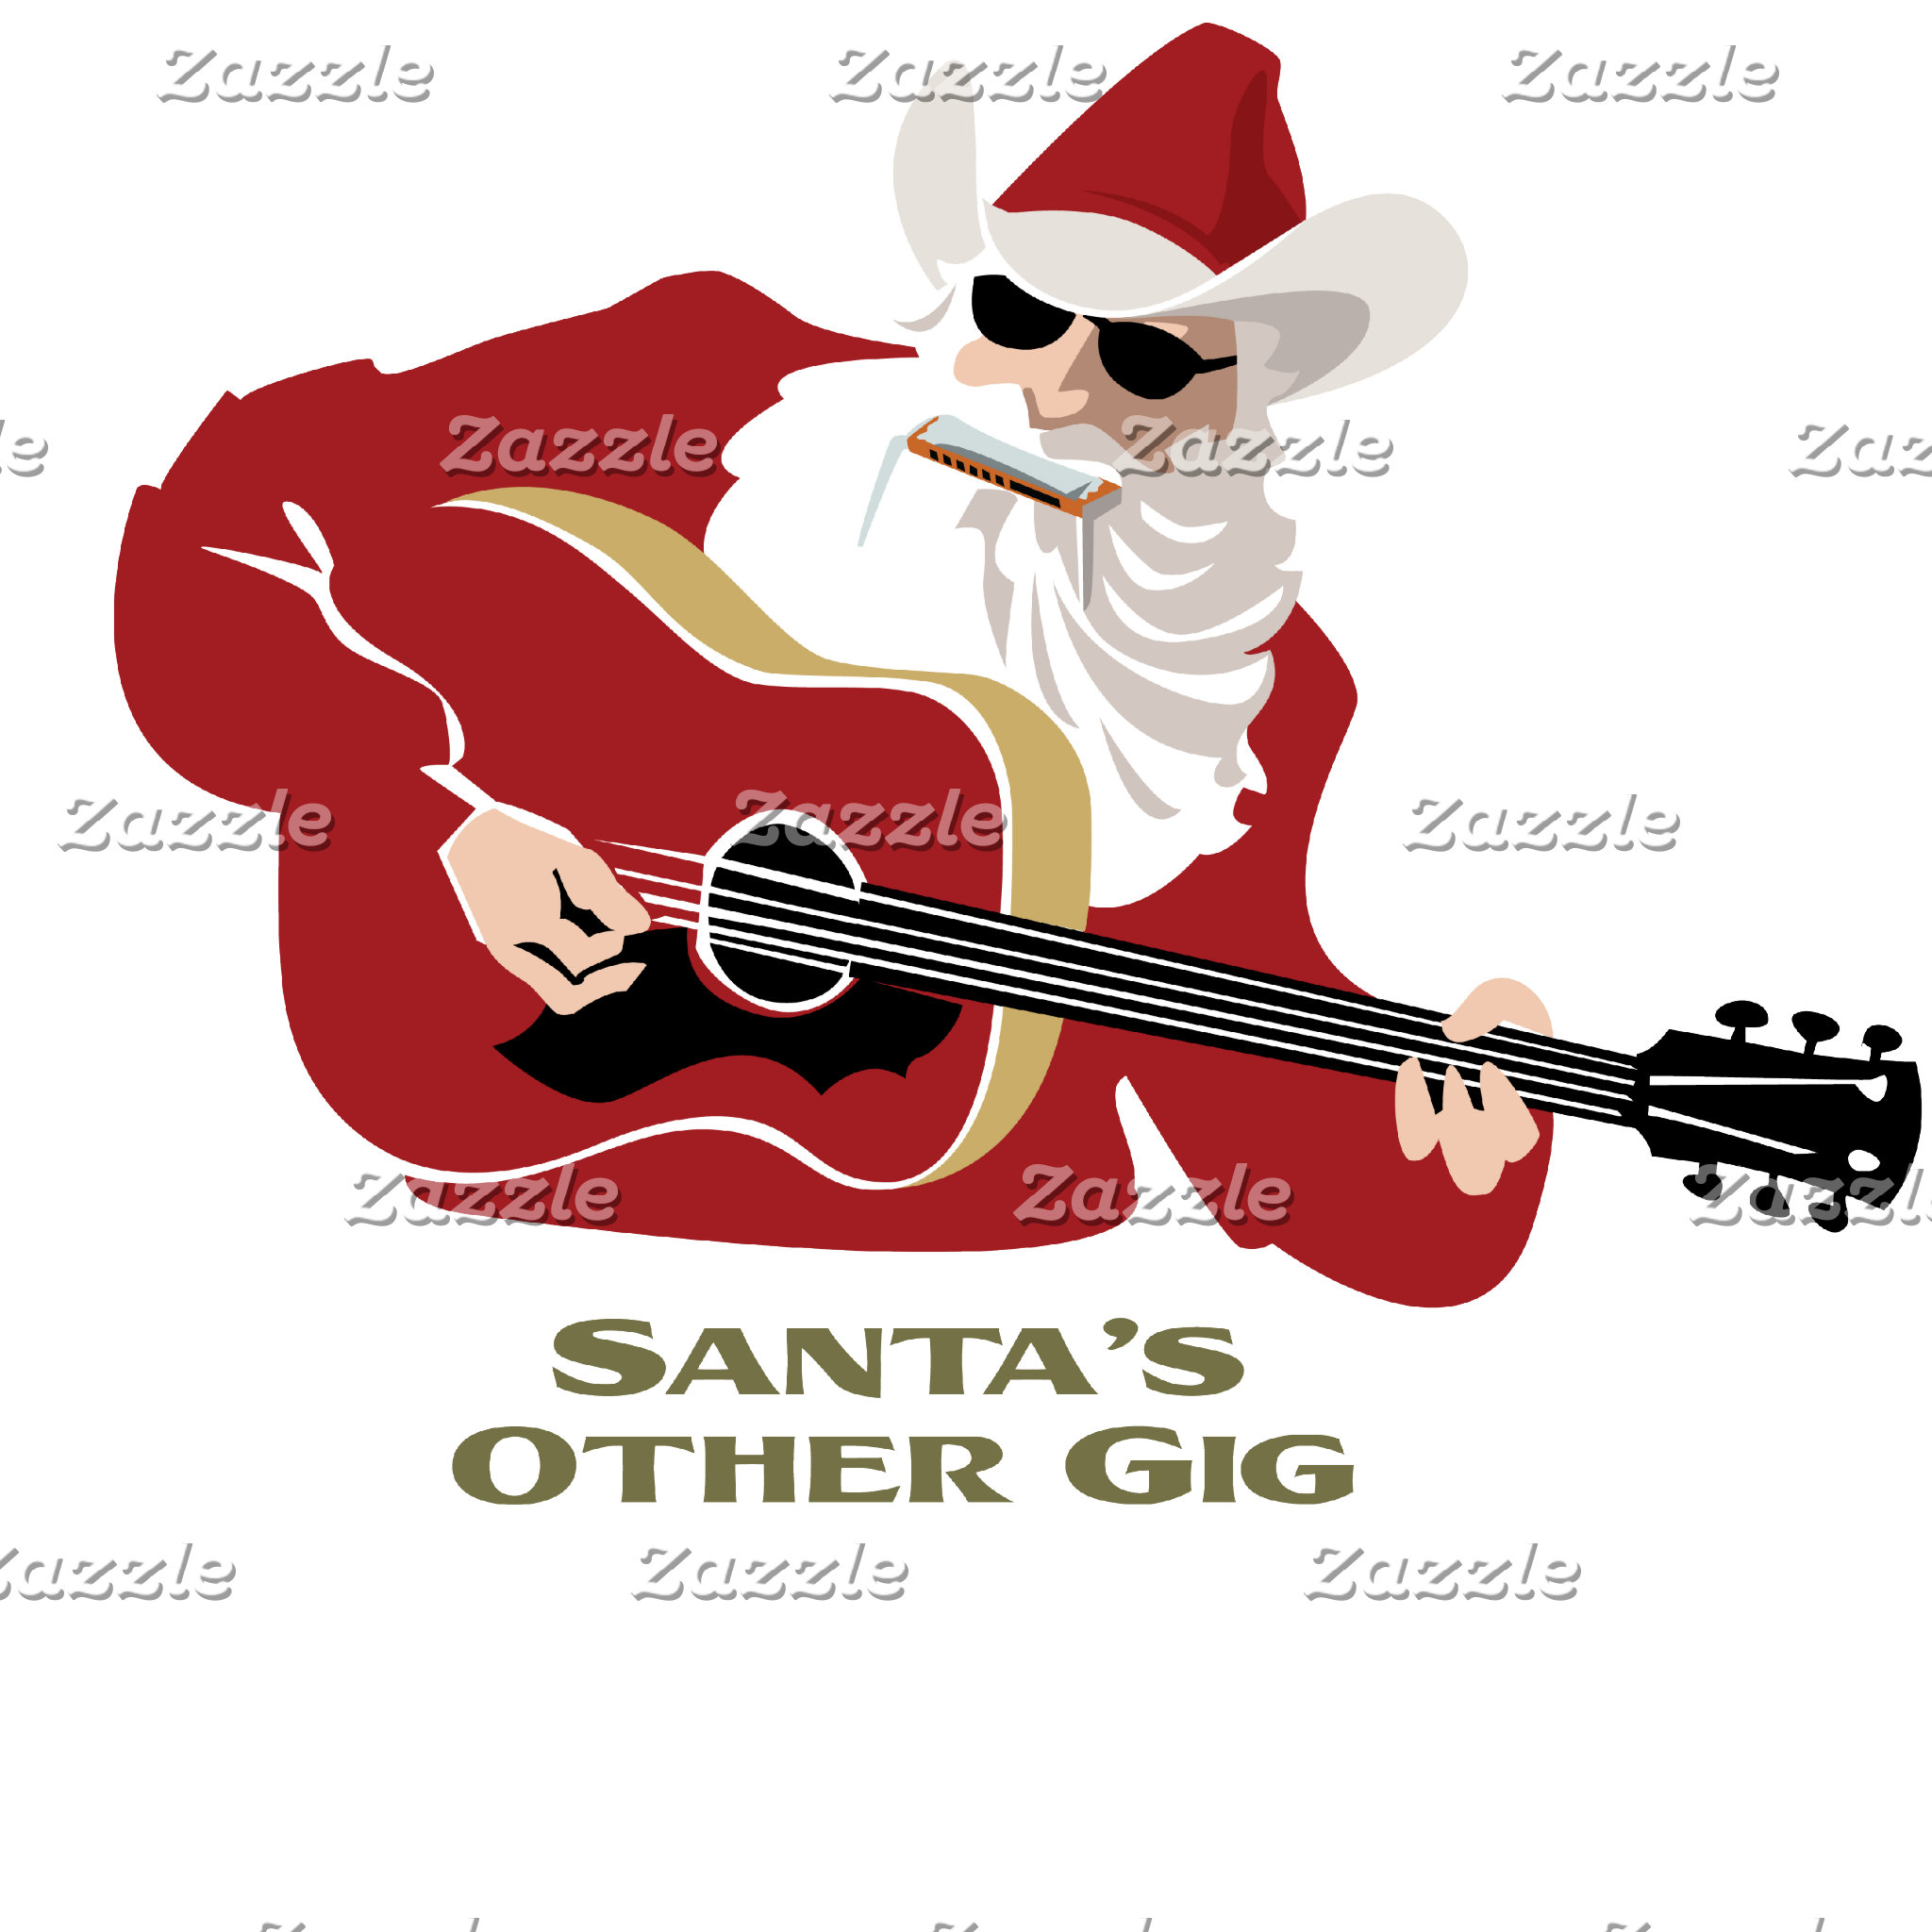 Santa's Other Gig